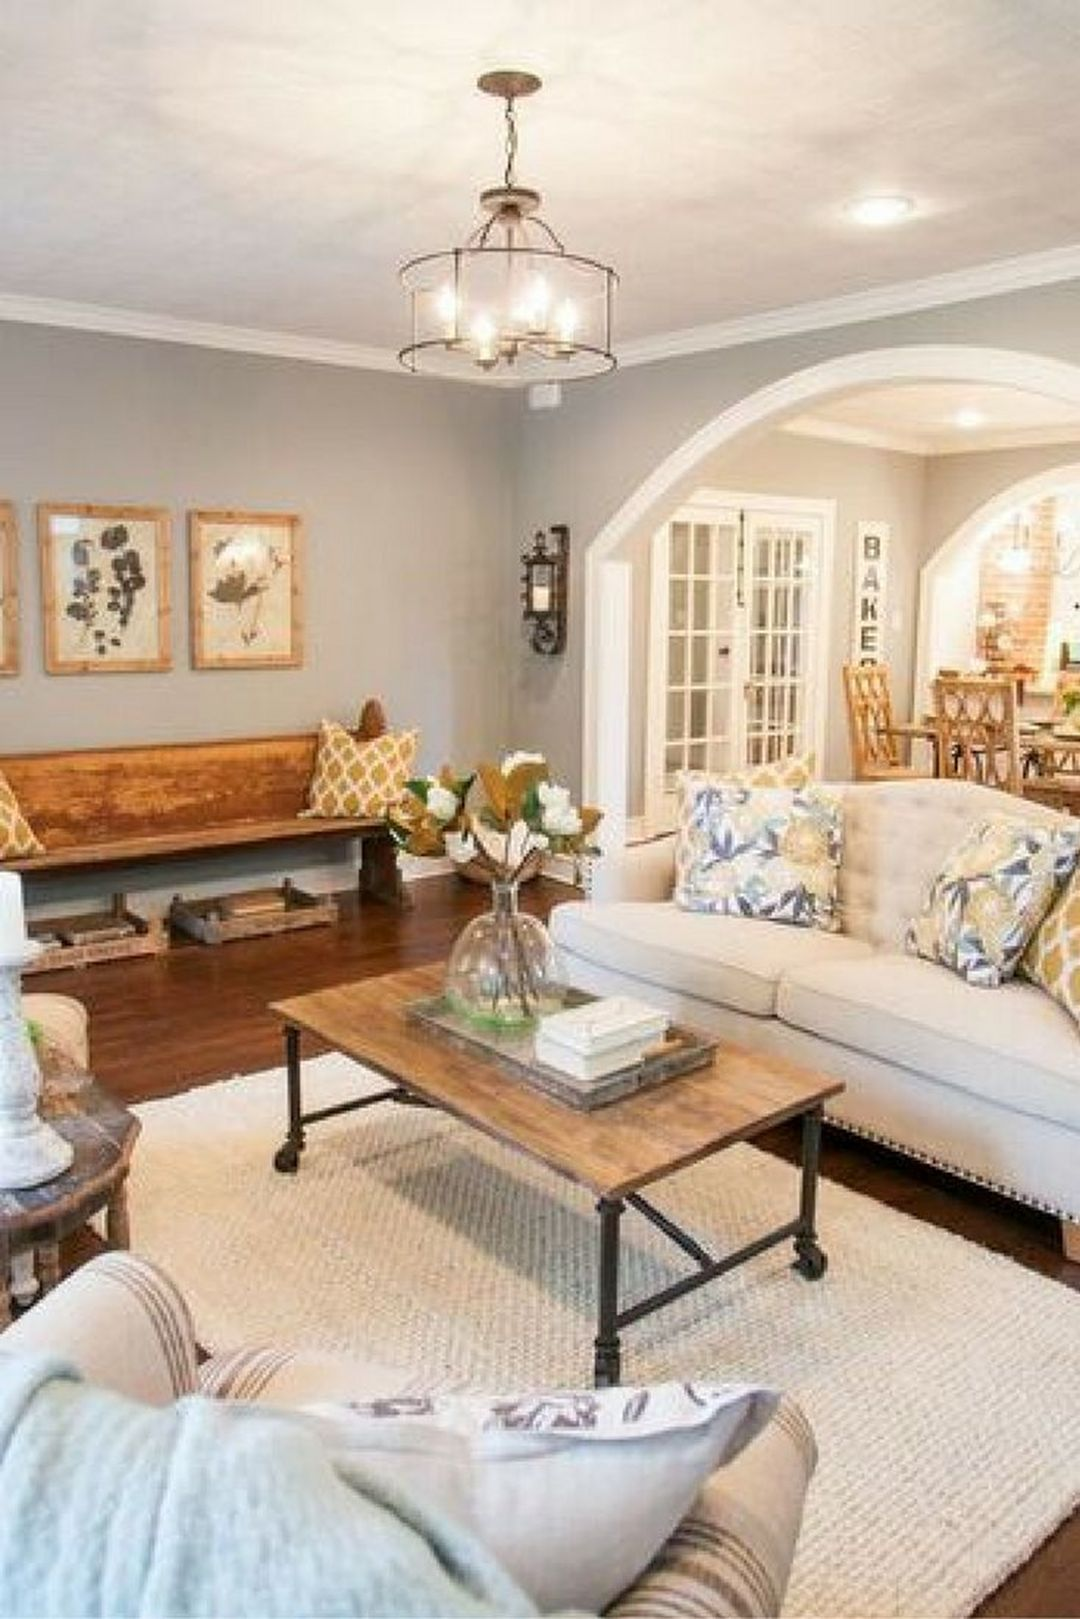 Cozy Romantic Living Room: Cozy And Romantic Living Room 1142 ...Read More